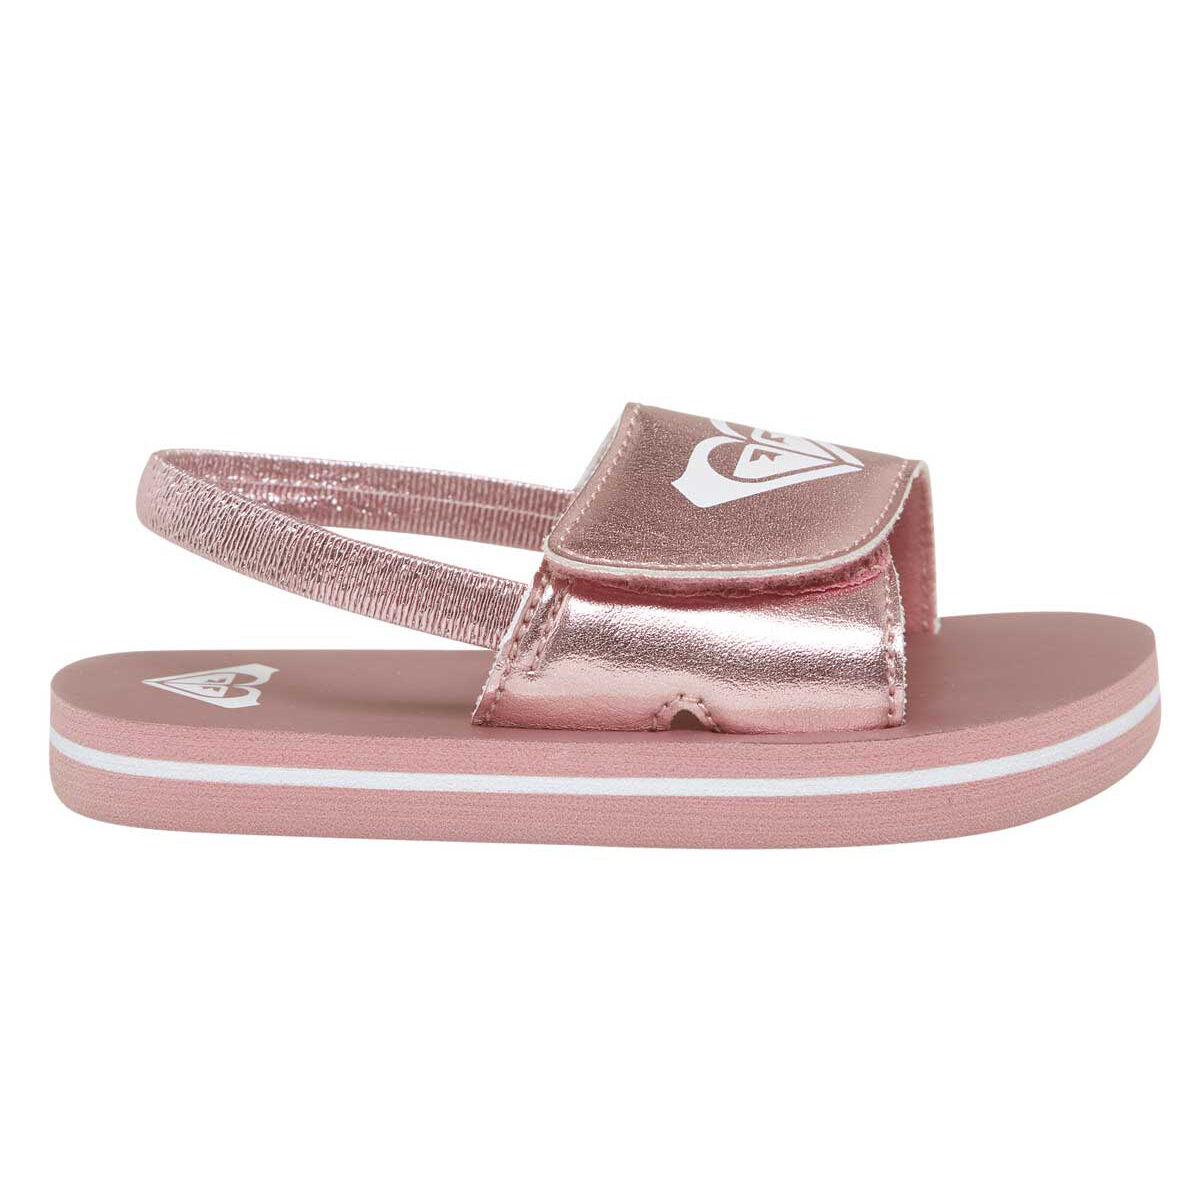 Roxy Finn Toddlers Sandals | Rebel Sport